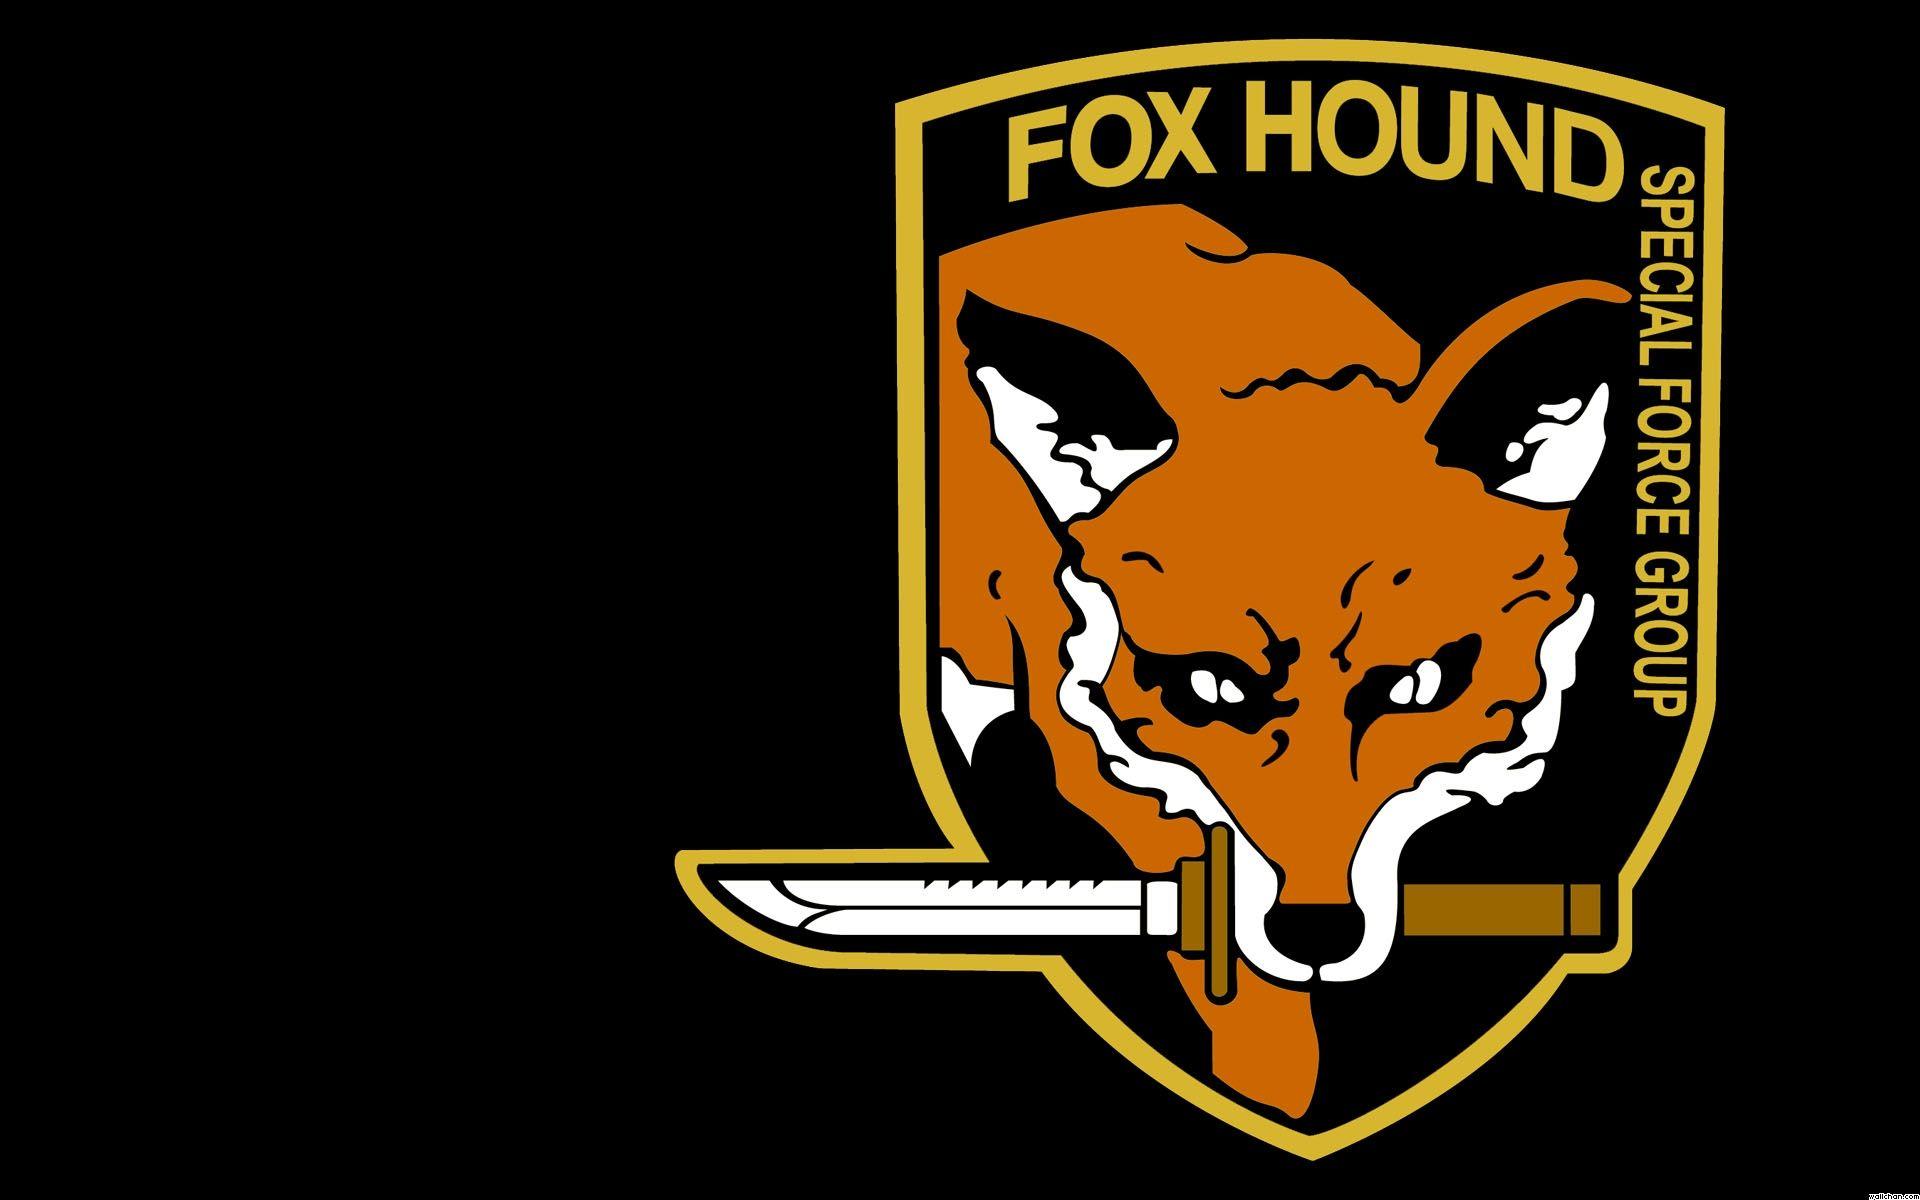 Foxhound wallpaper wallpapersafari - Foxhound metal gear wallpaper ...